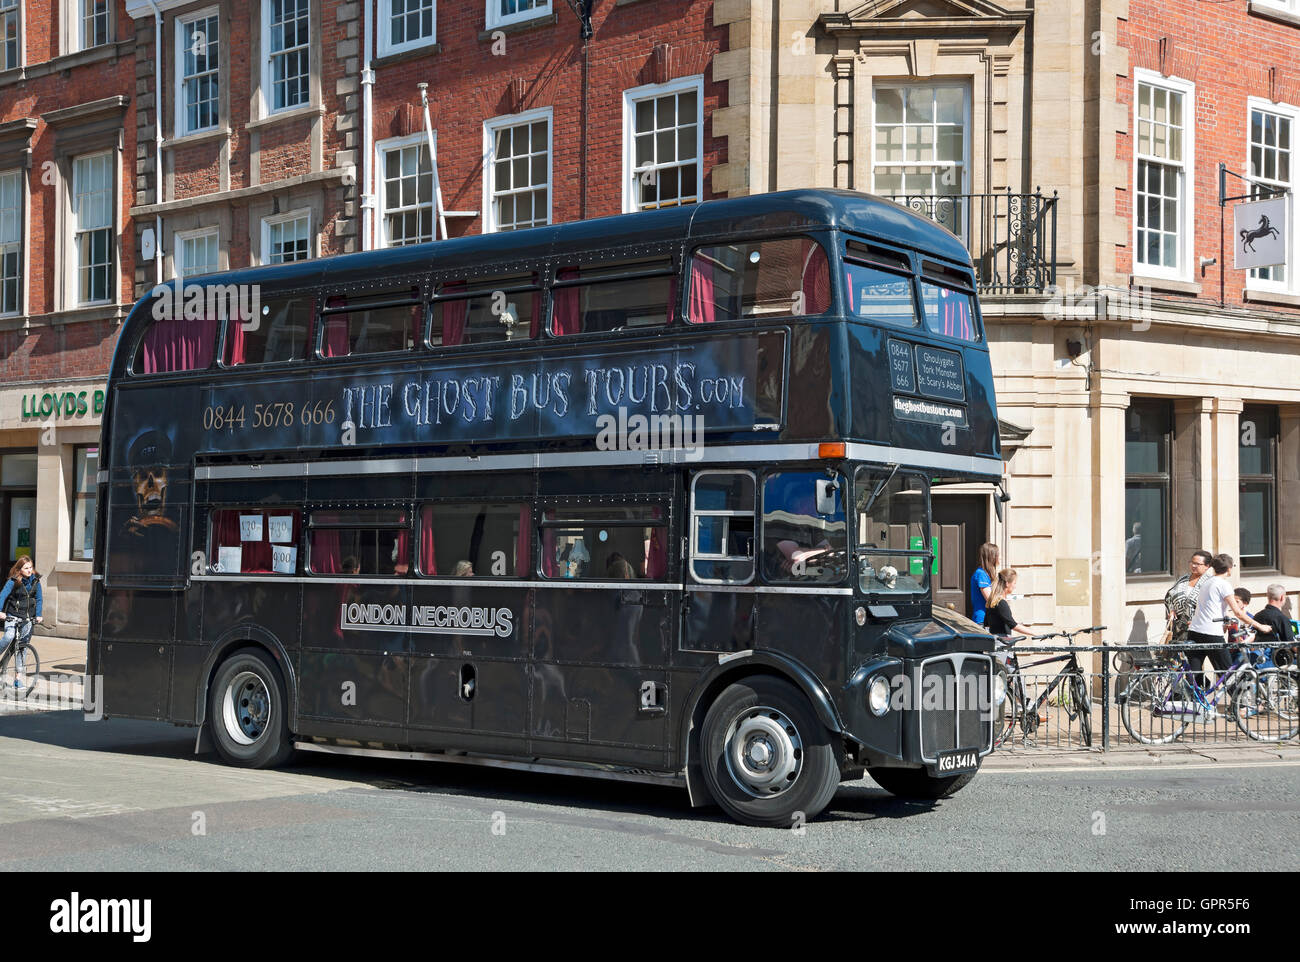 Ghost tour bus York North Yorkshire England UK United Kingdom GB Great Britain Stock Photo